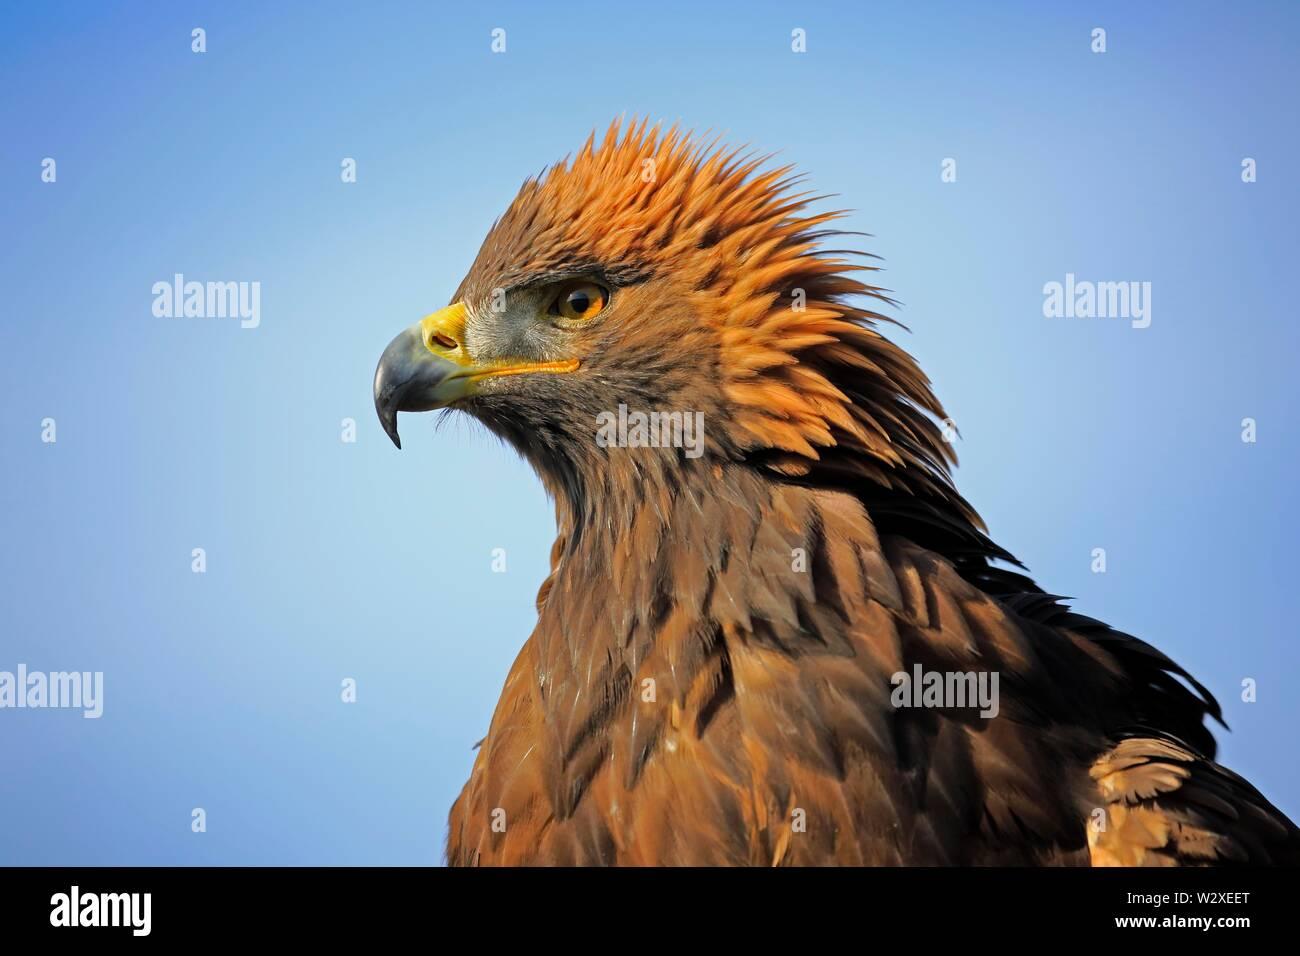 Golden eagle (Aquila chrysaetos), adult, animal portrait, Slovakia - Stock Image